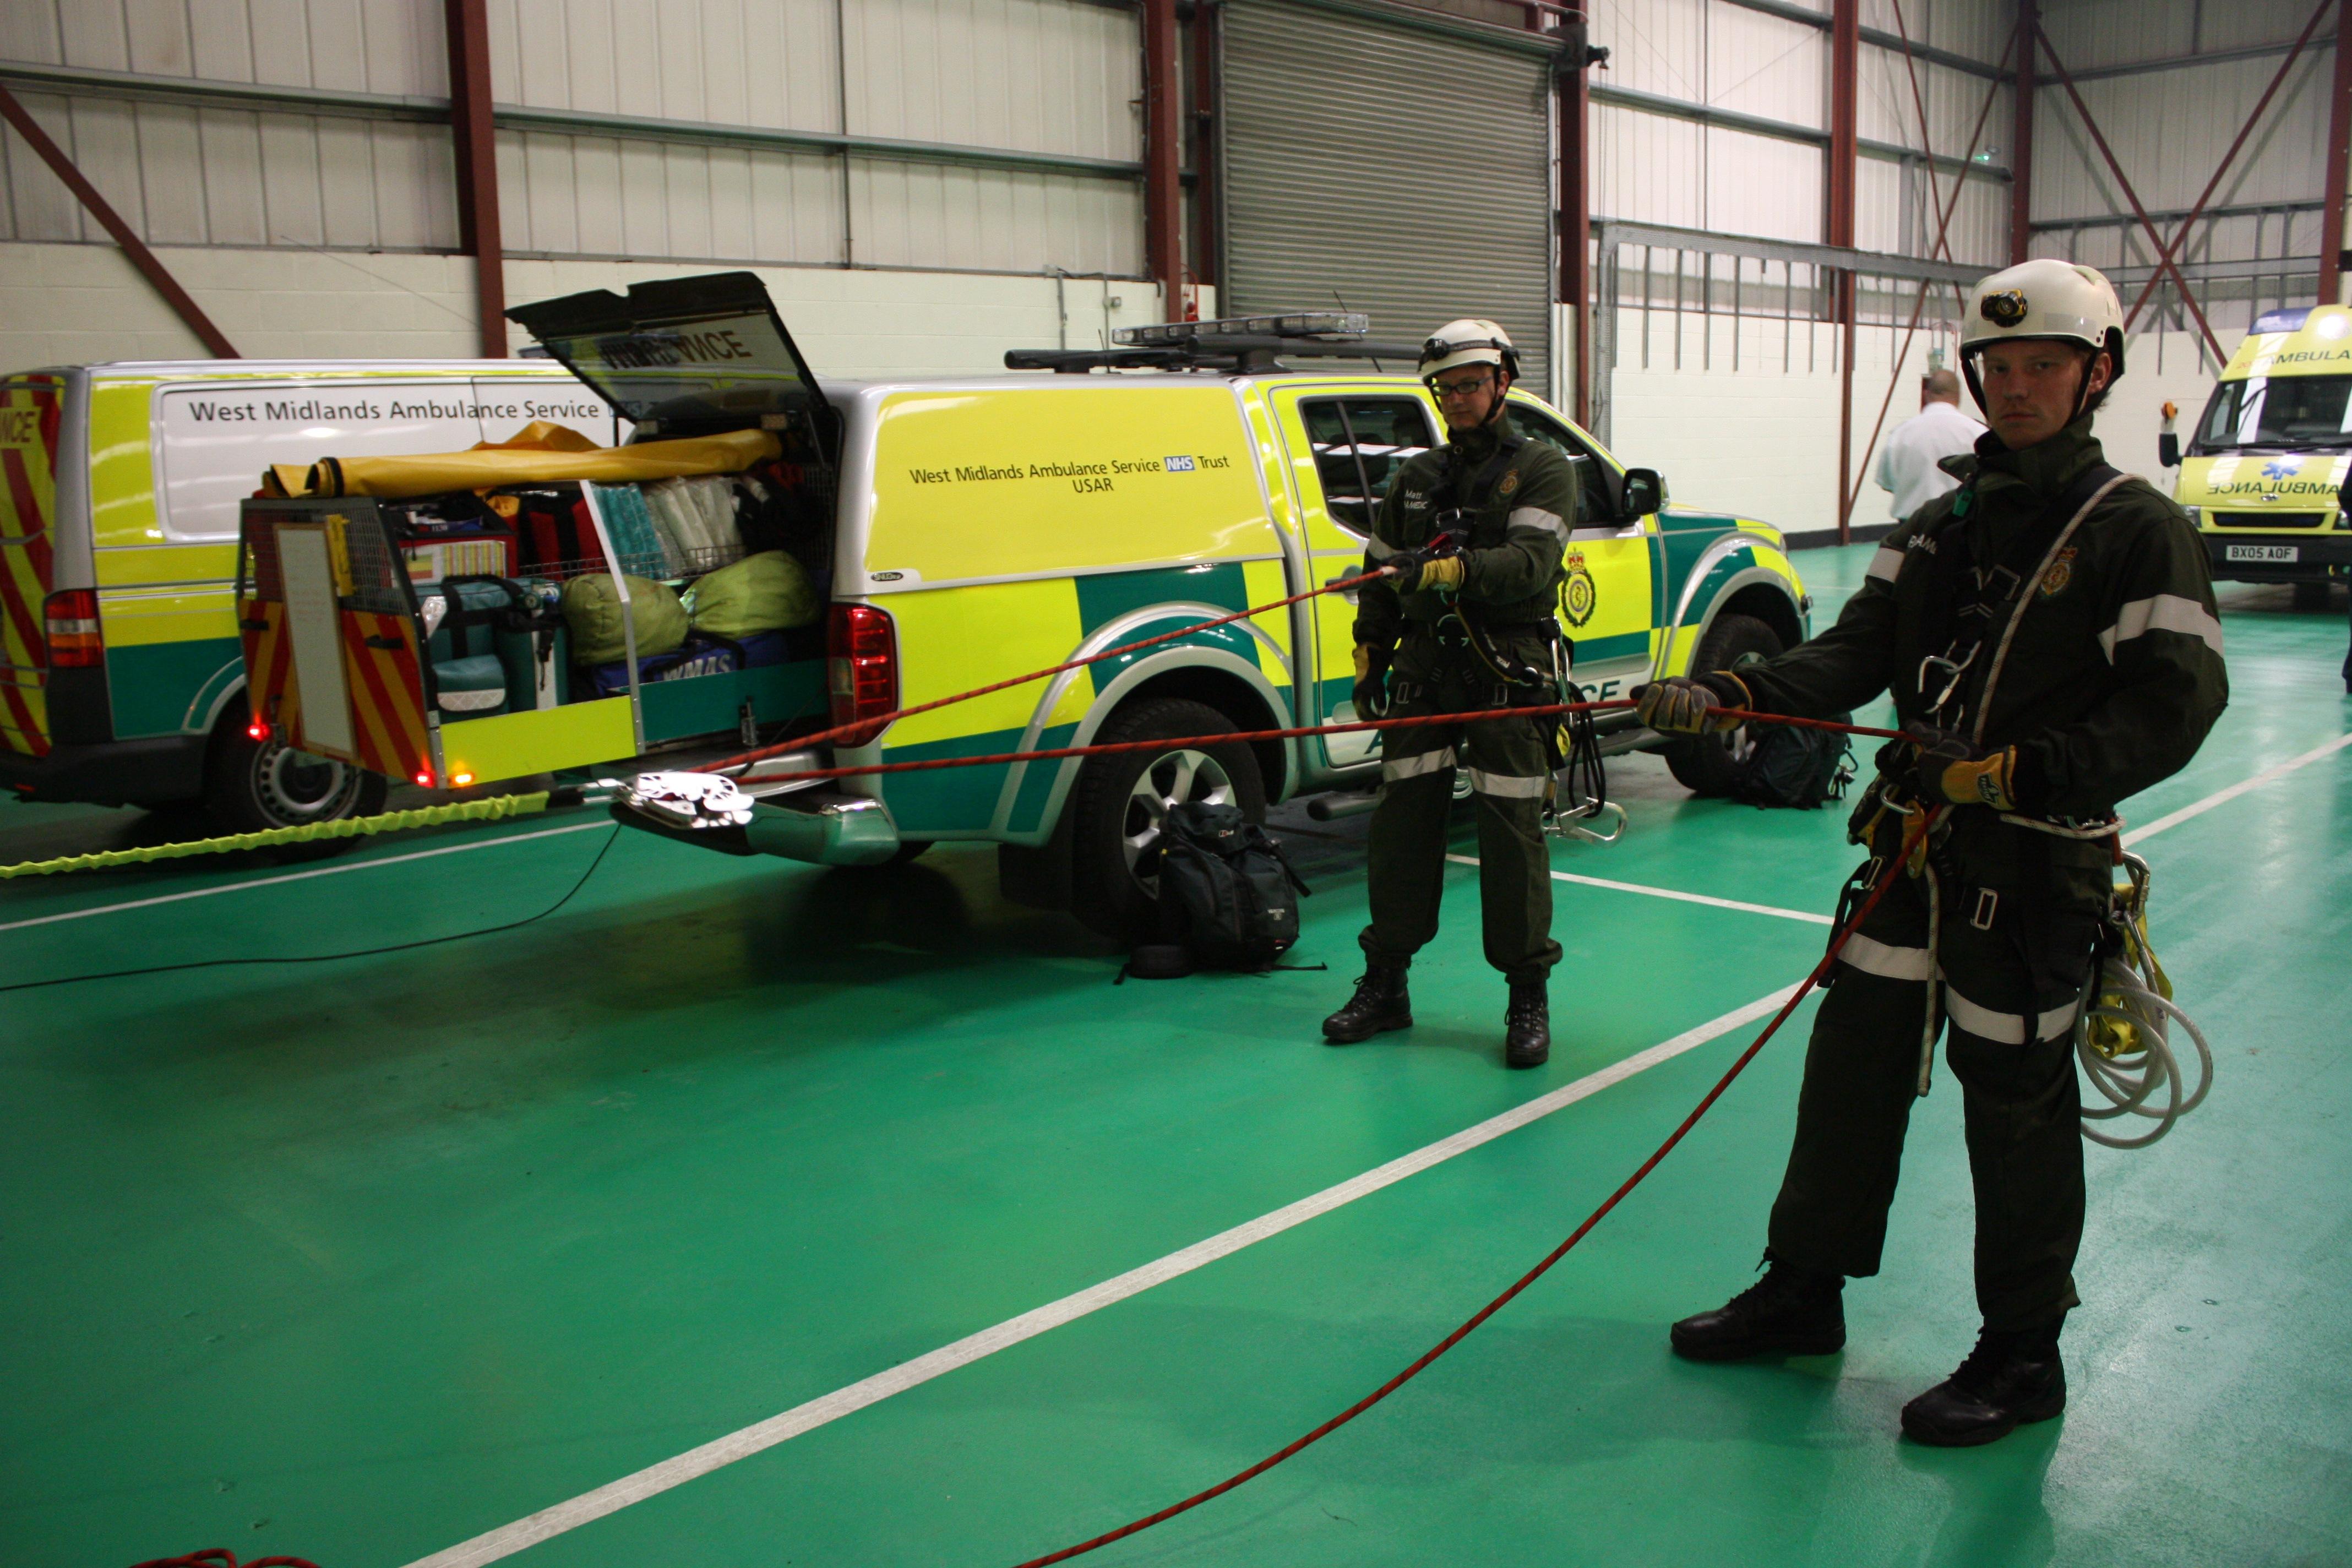 Emergency Live | How does HART train its paramedics? image 5